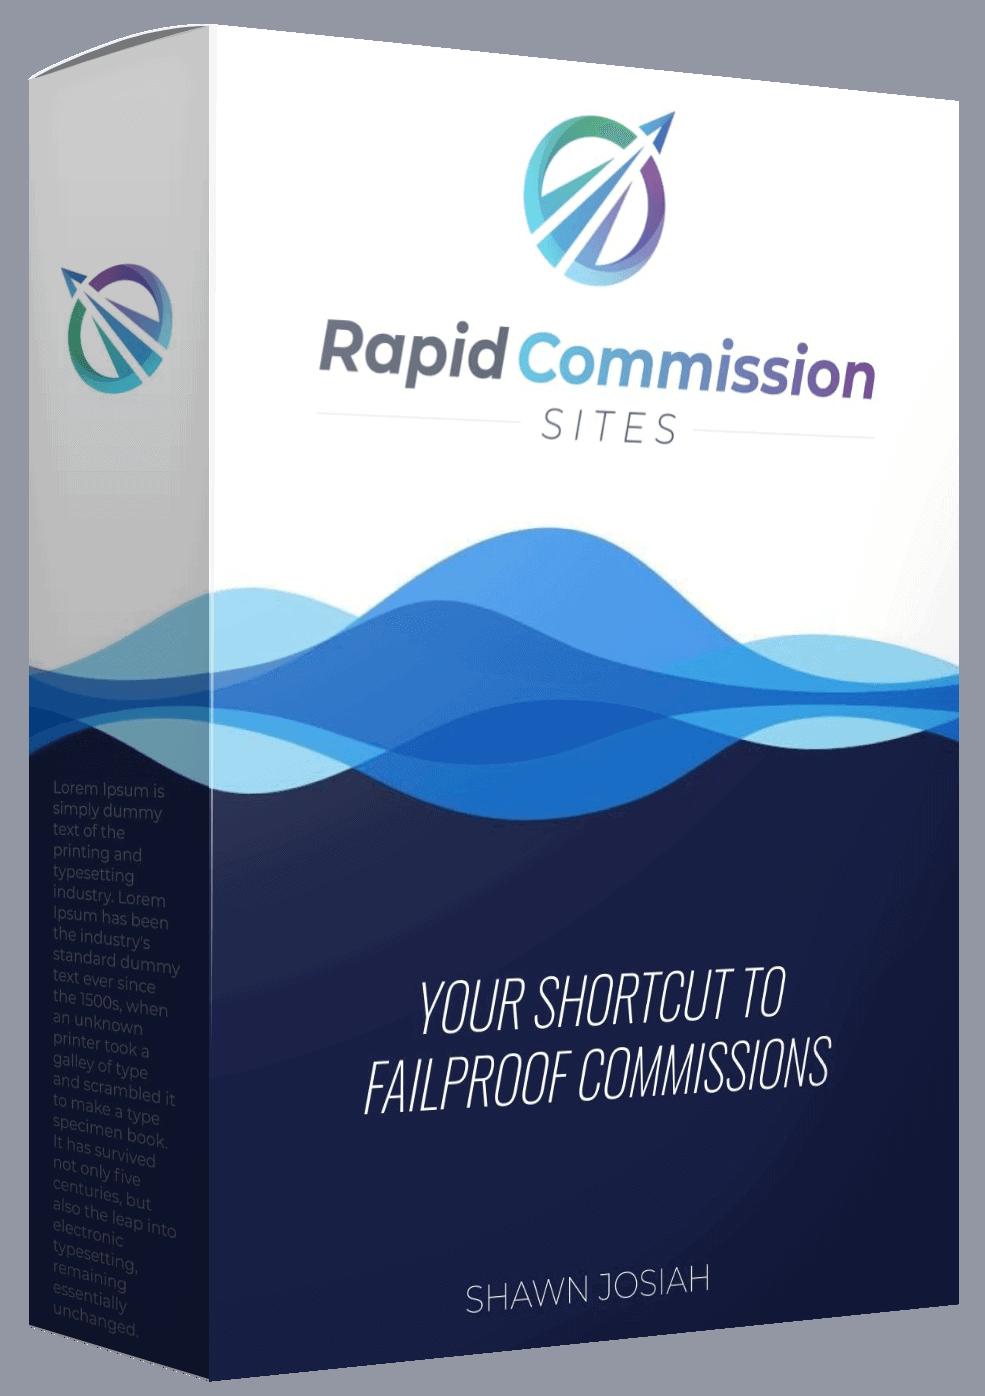 Rapid Commission Sites Review